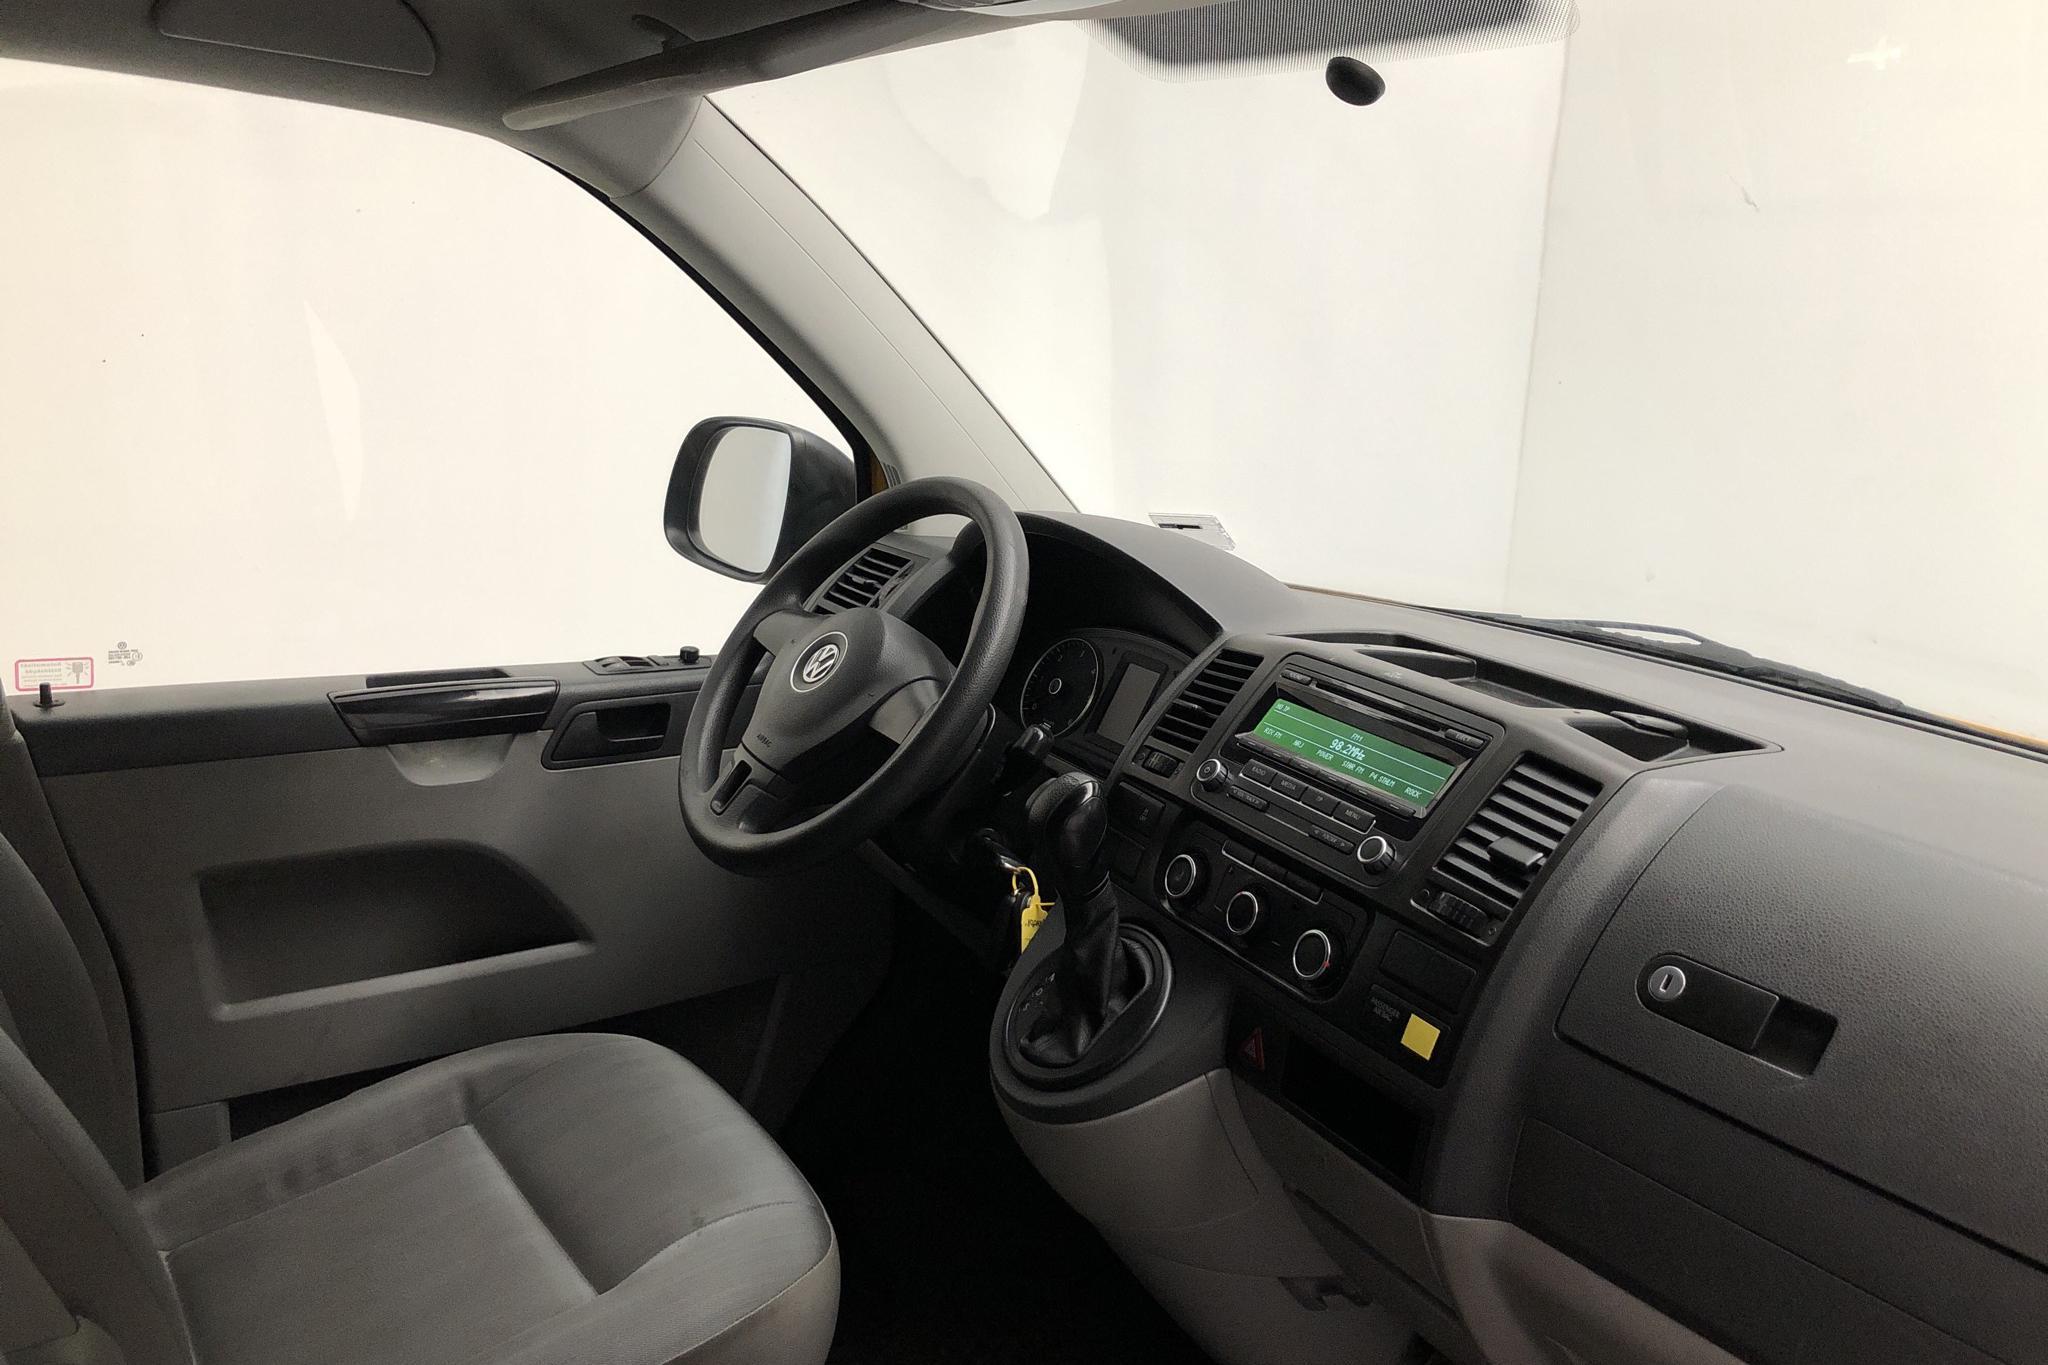 VW Transporter T5 2.0 TDI (140hk) - 26 700 km - Automatic - yellow - 2013